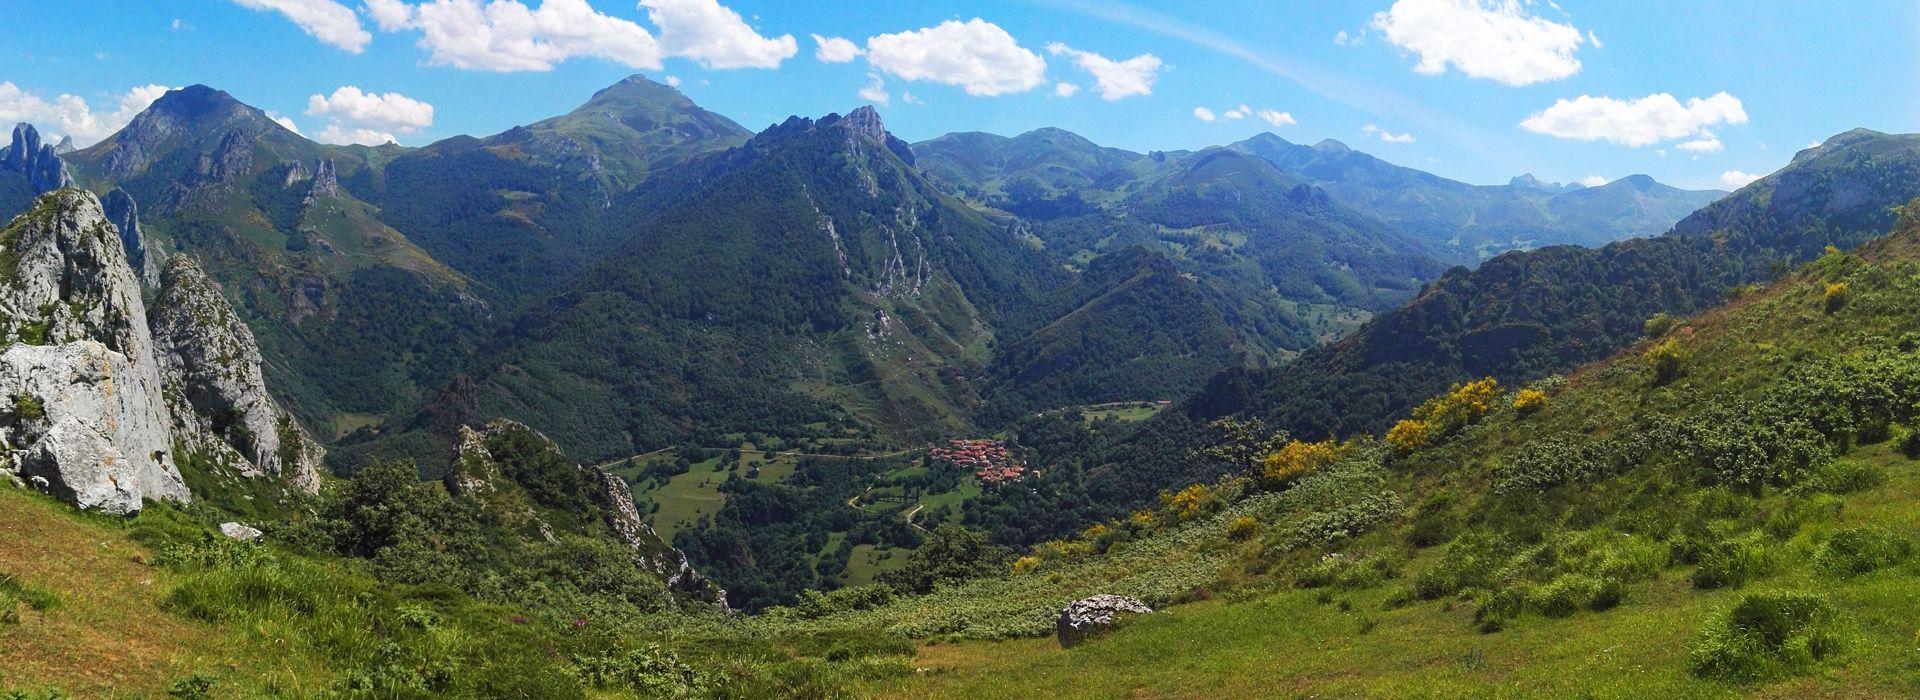 panoramica-picos-europa-y-dobres